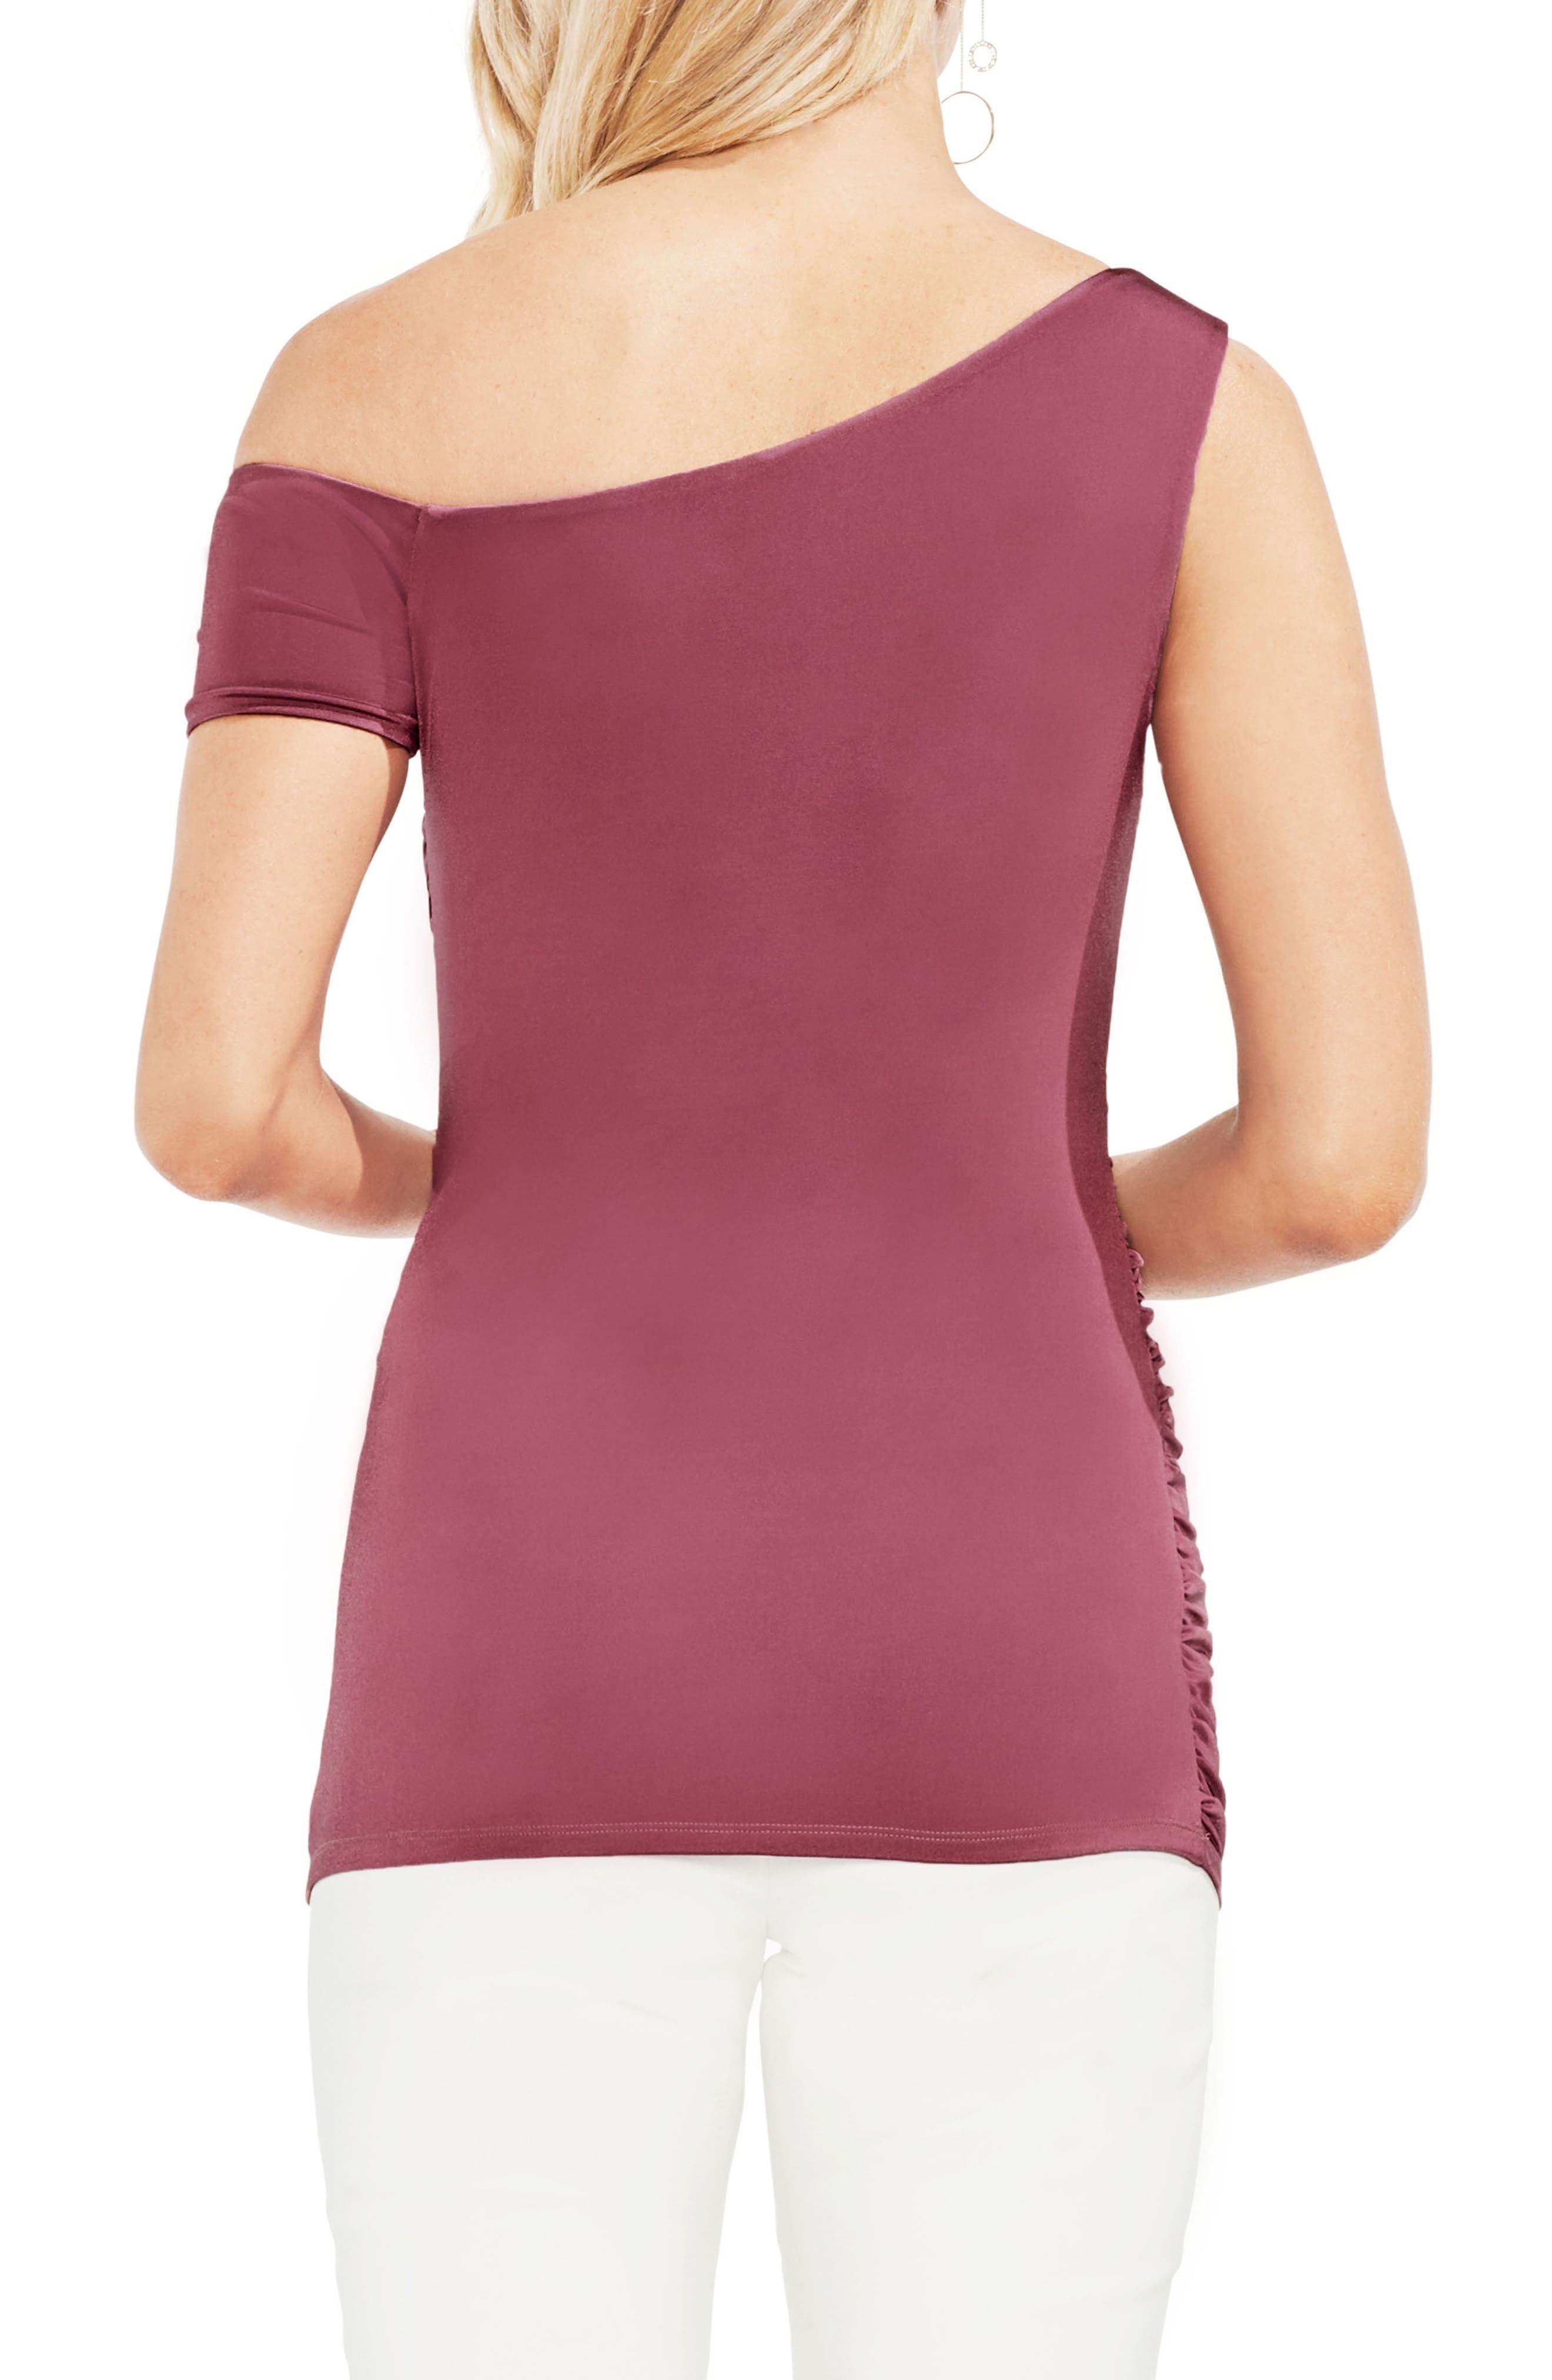 One-Shoulder Ruched Liquid Knit Top,                             Alternate thumbnail 2, color,                             803-Summer Rose